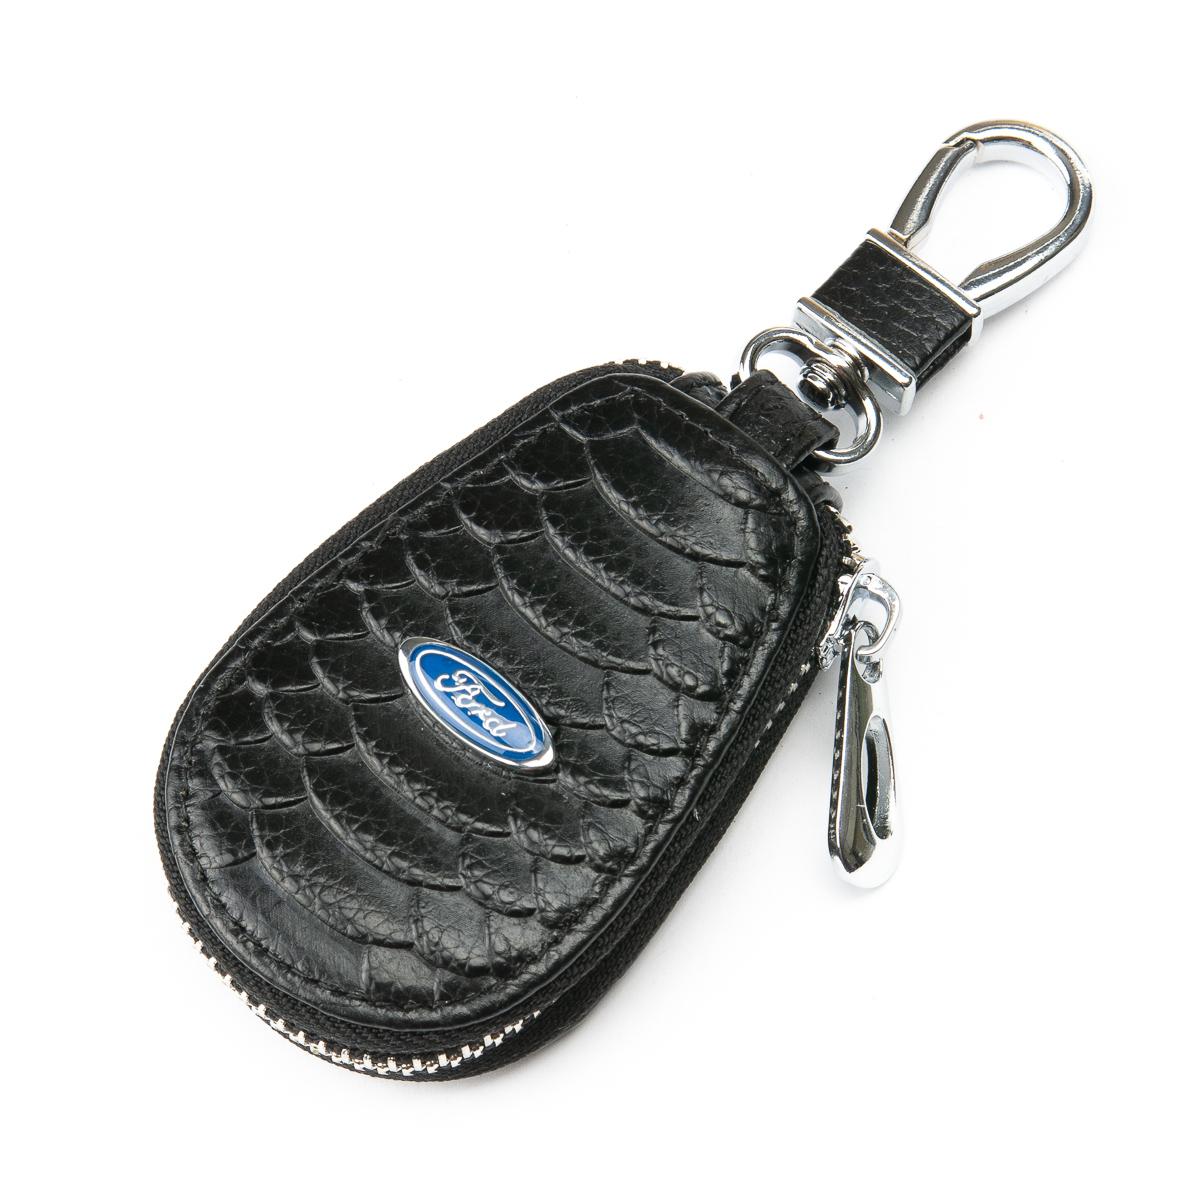 Кошелек Ключница Авто кожа F625 Ford black